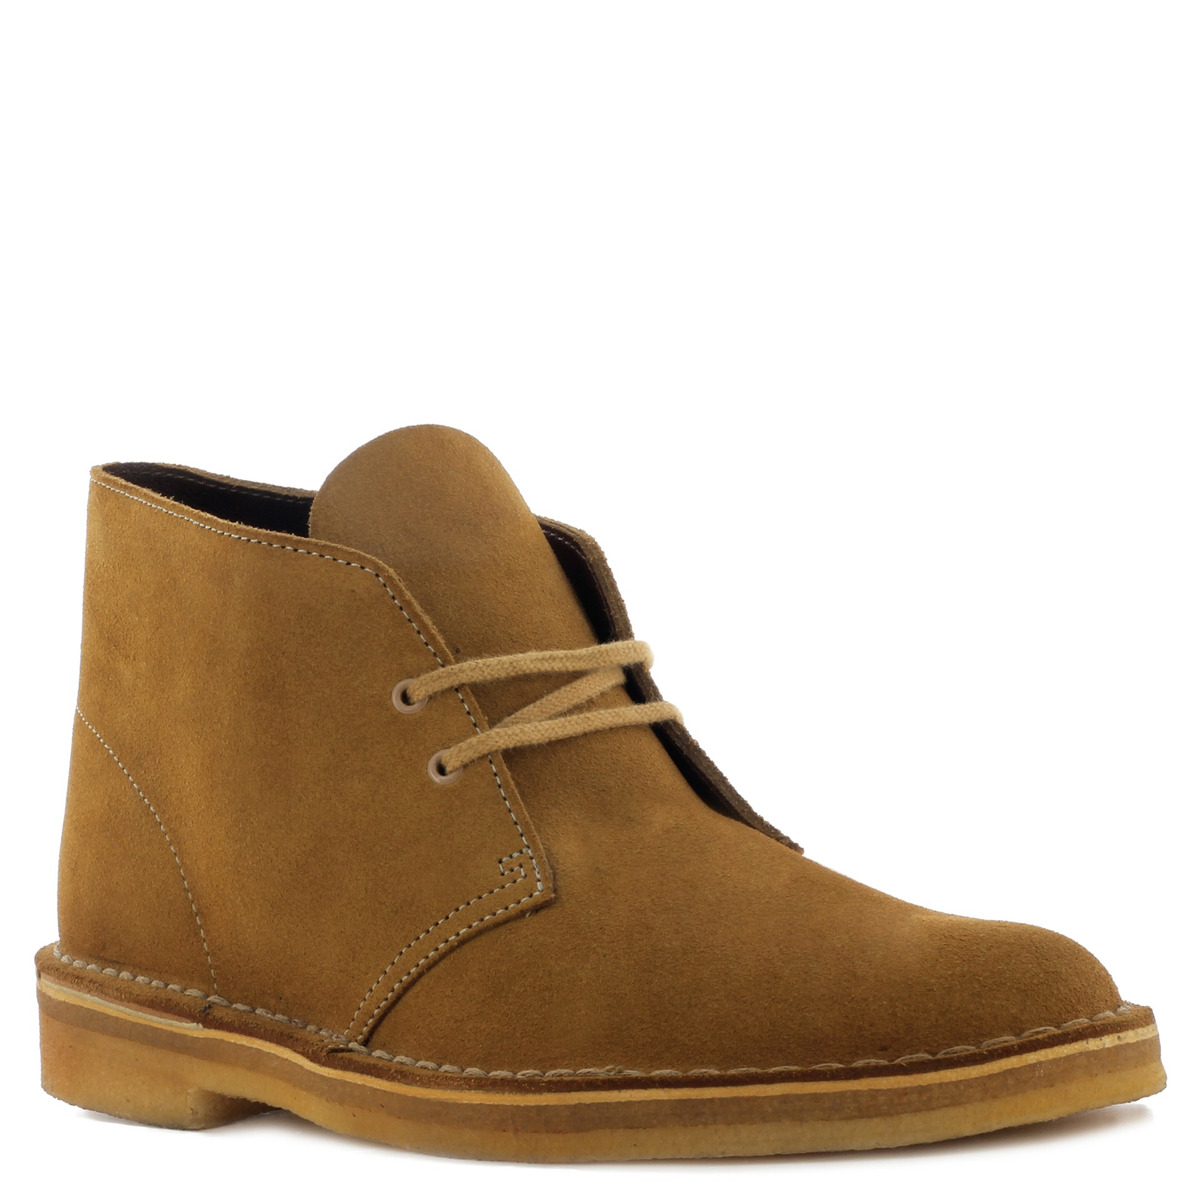 Desert Boot 098858133 Hombre 061 Bota Clarks LqVGMpSUz